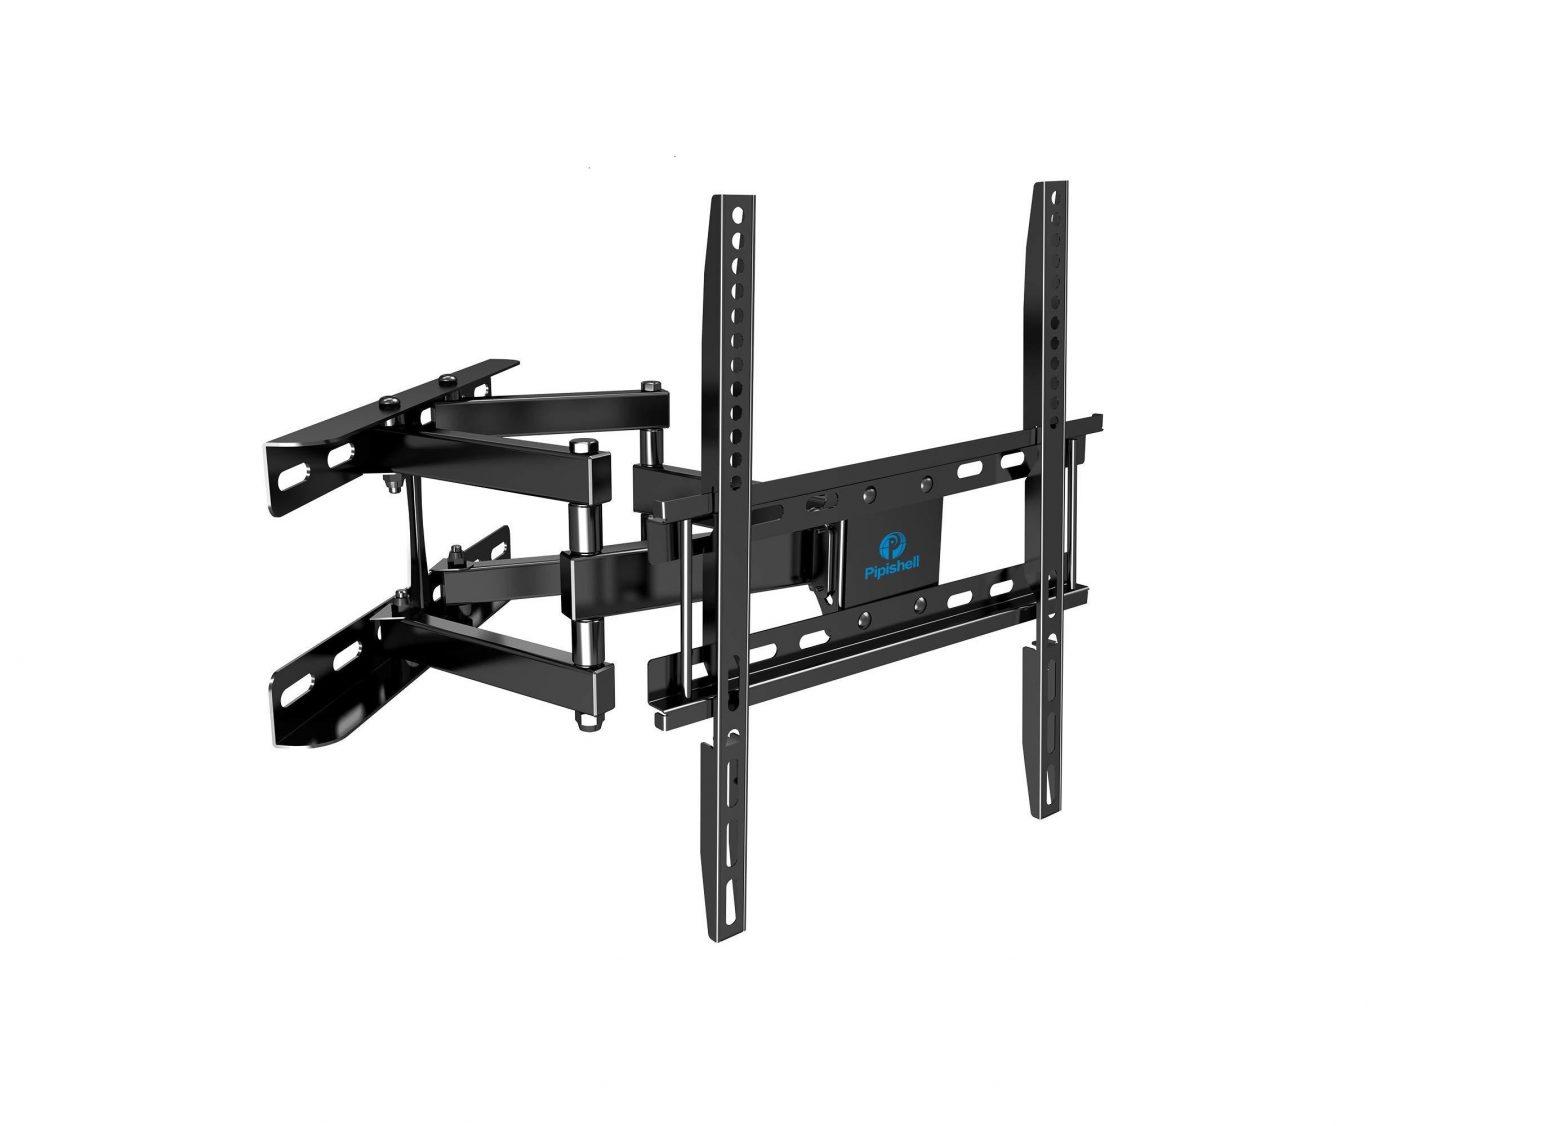 Buy cheap tv wall mounts at tech vision electronics